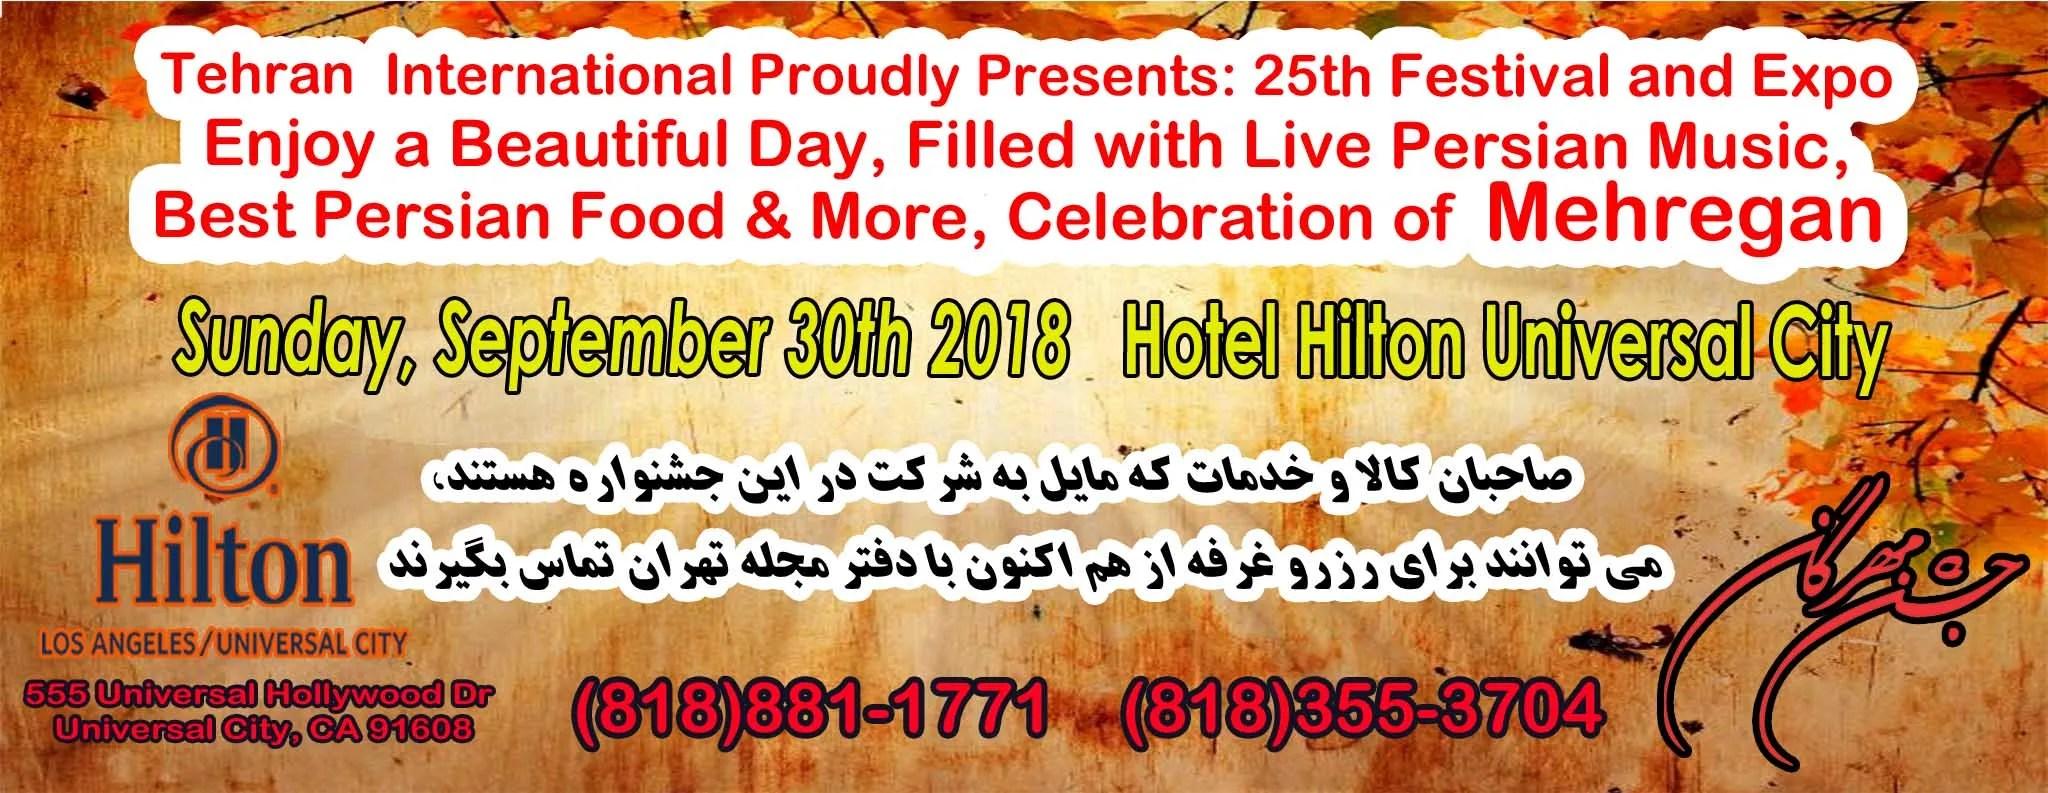 tehran-magazine-festival-expo-shahbod-noori